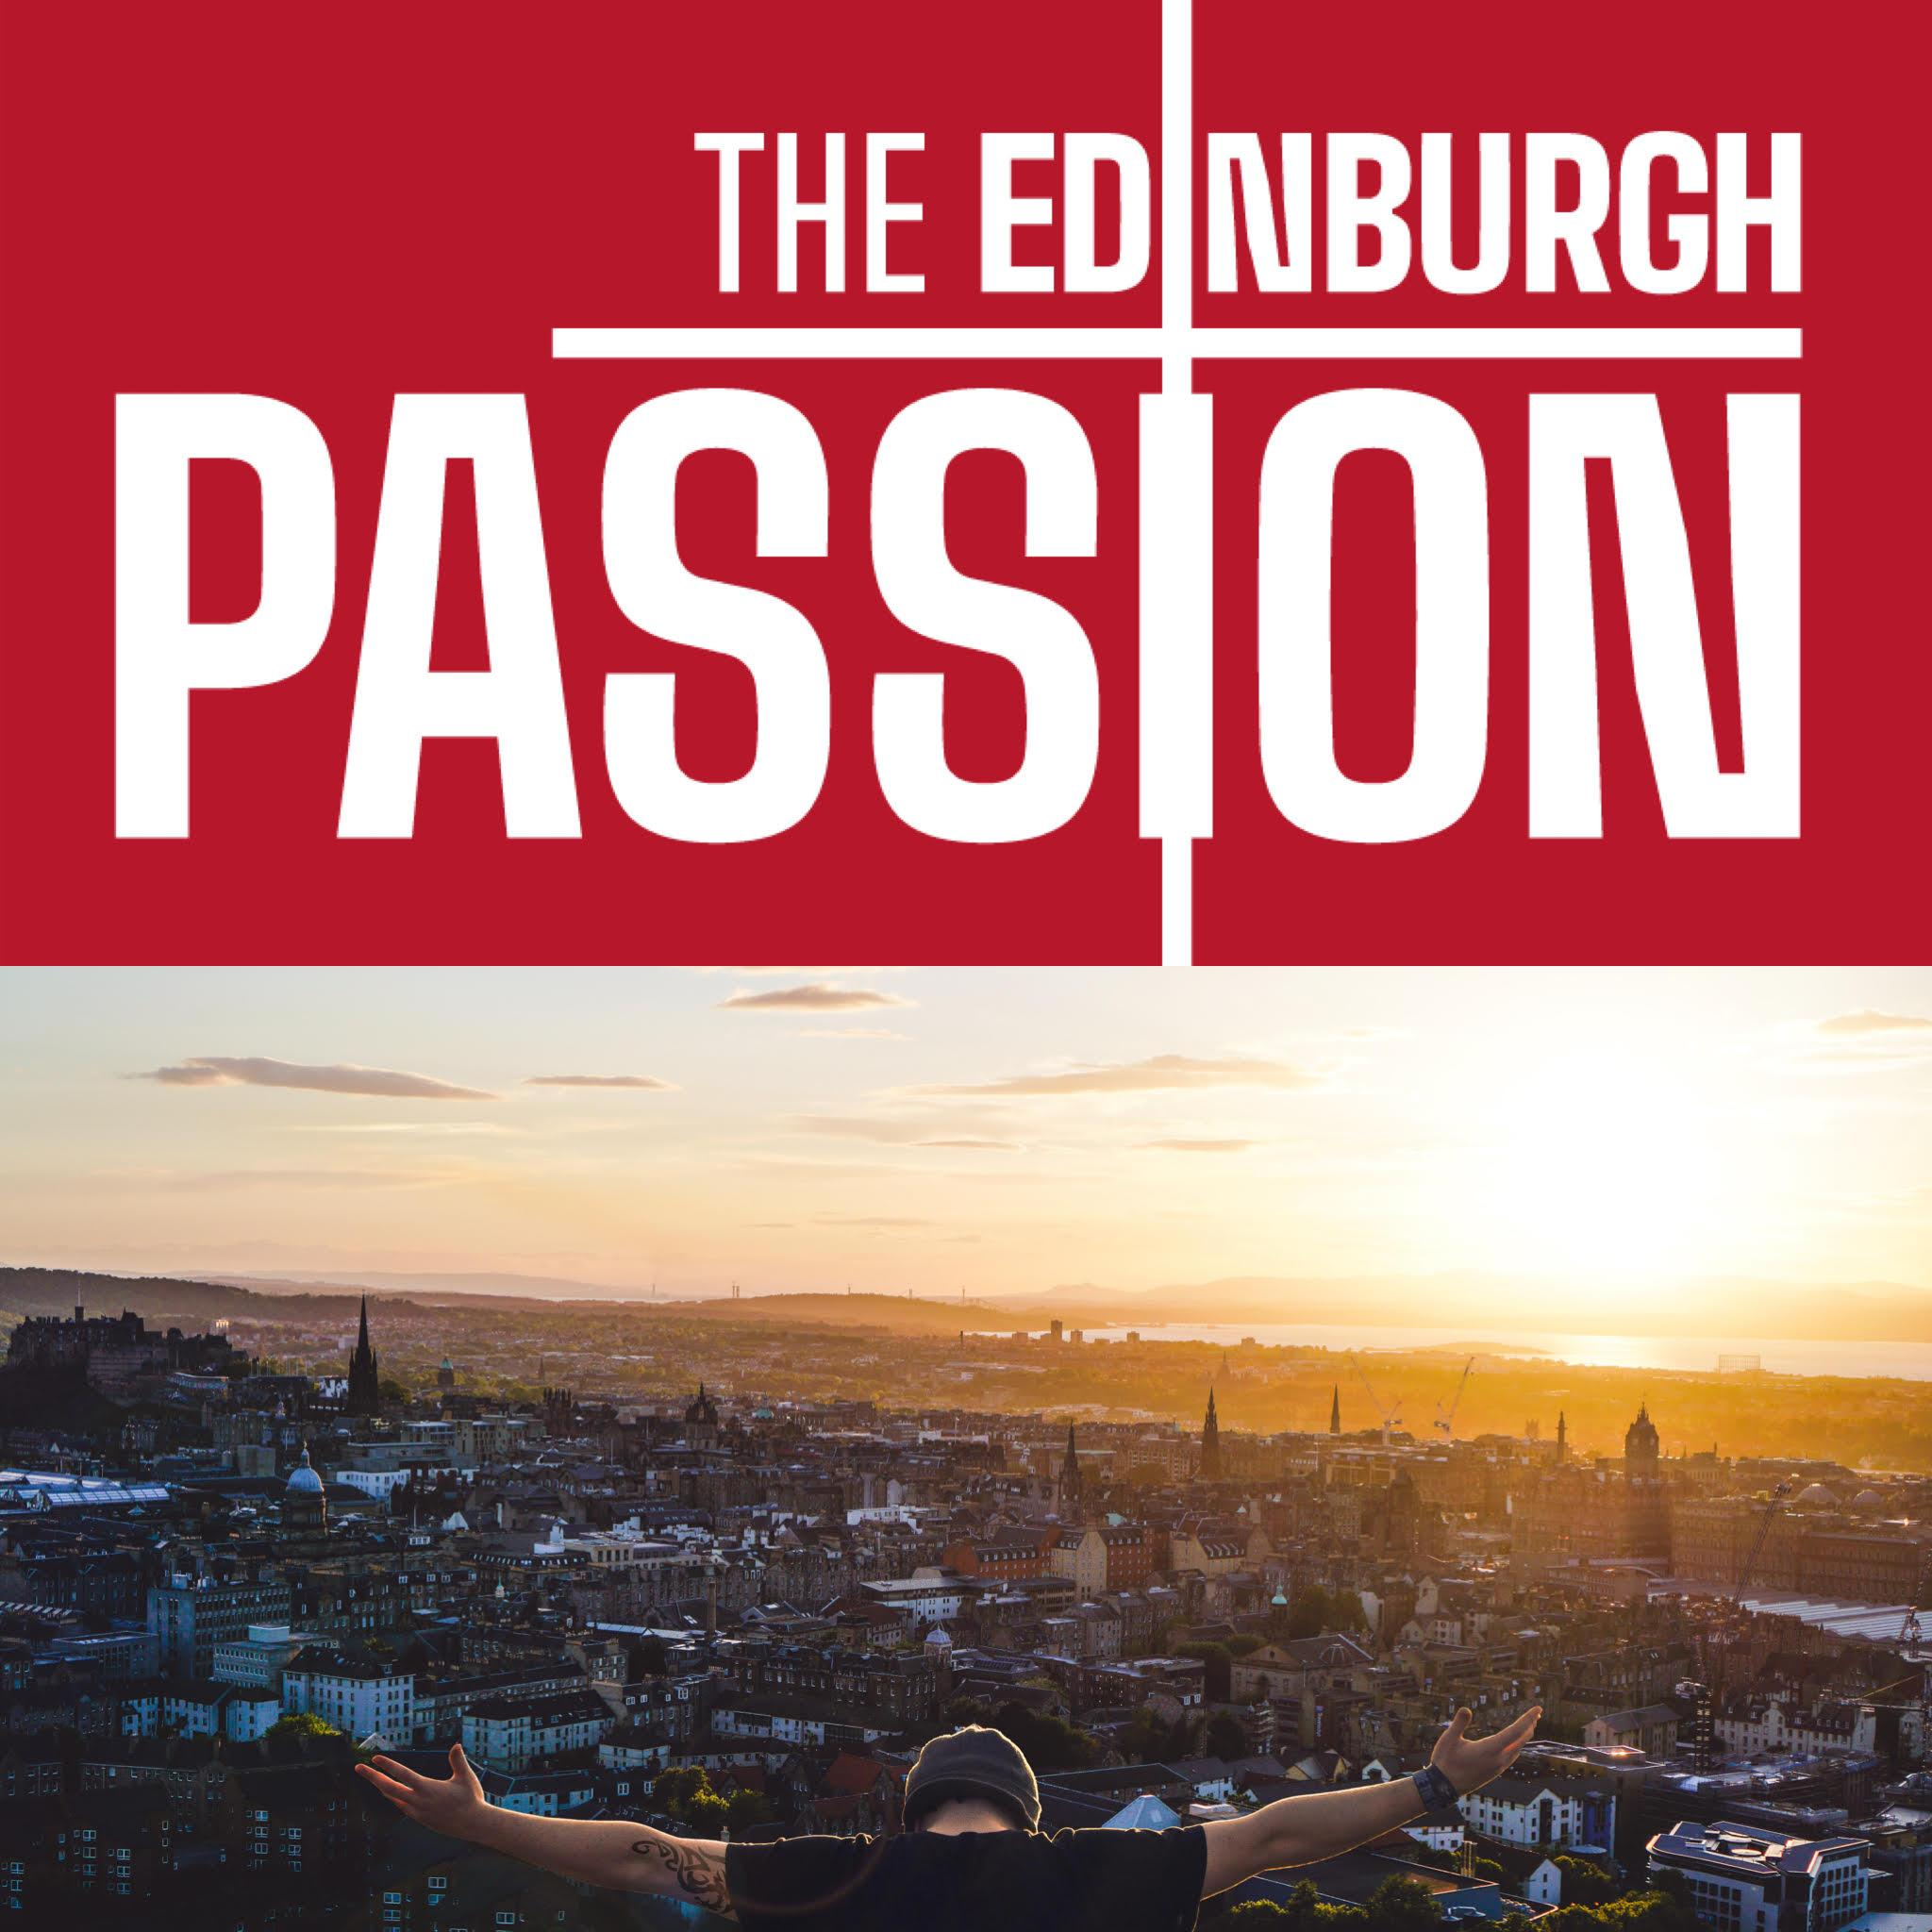 Edinburgh Passion Last Supper - Cyrenians Flavour and Haver